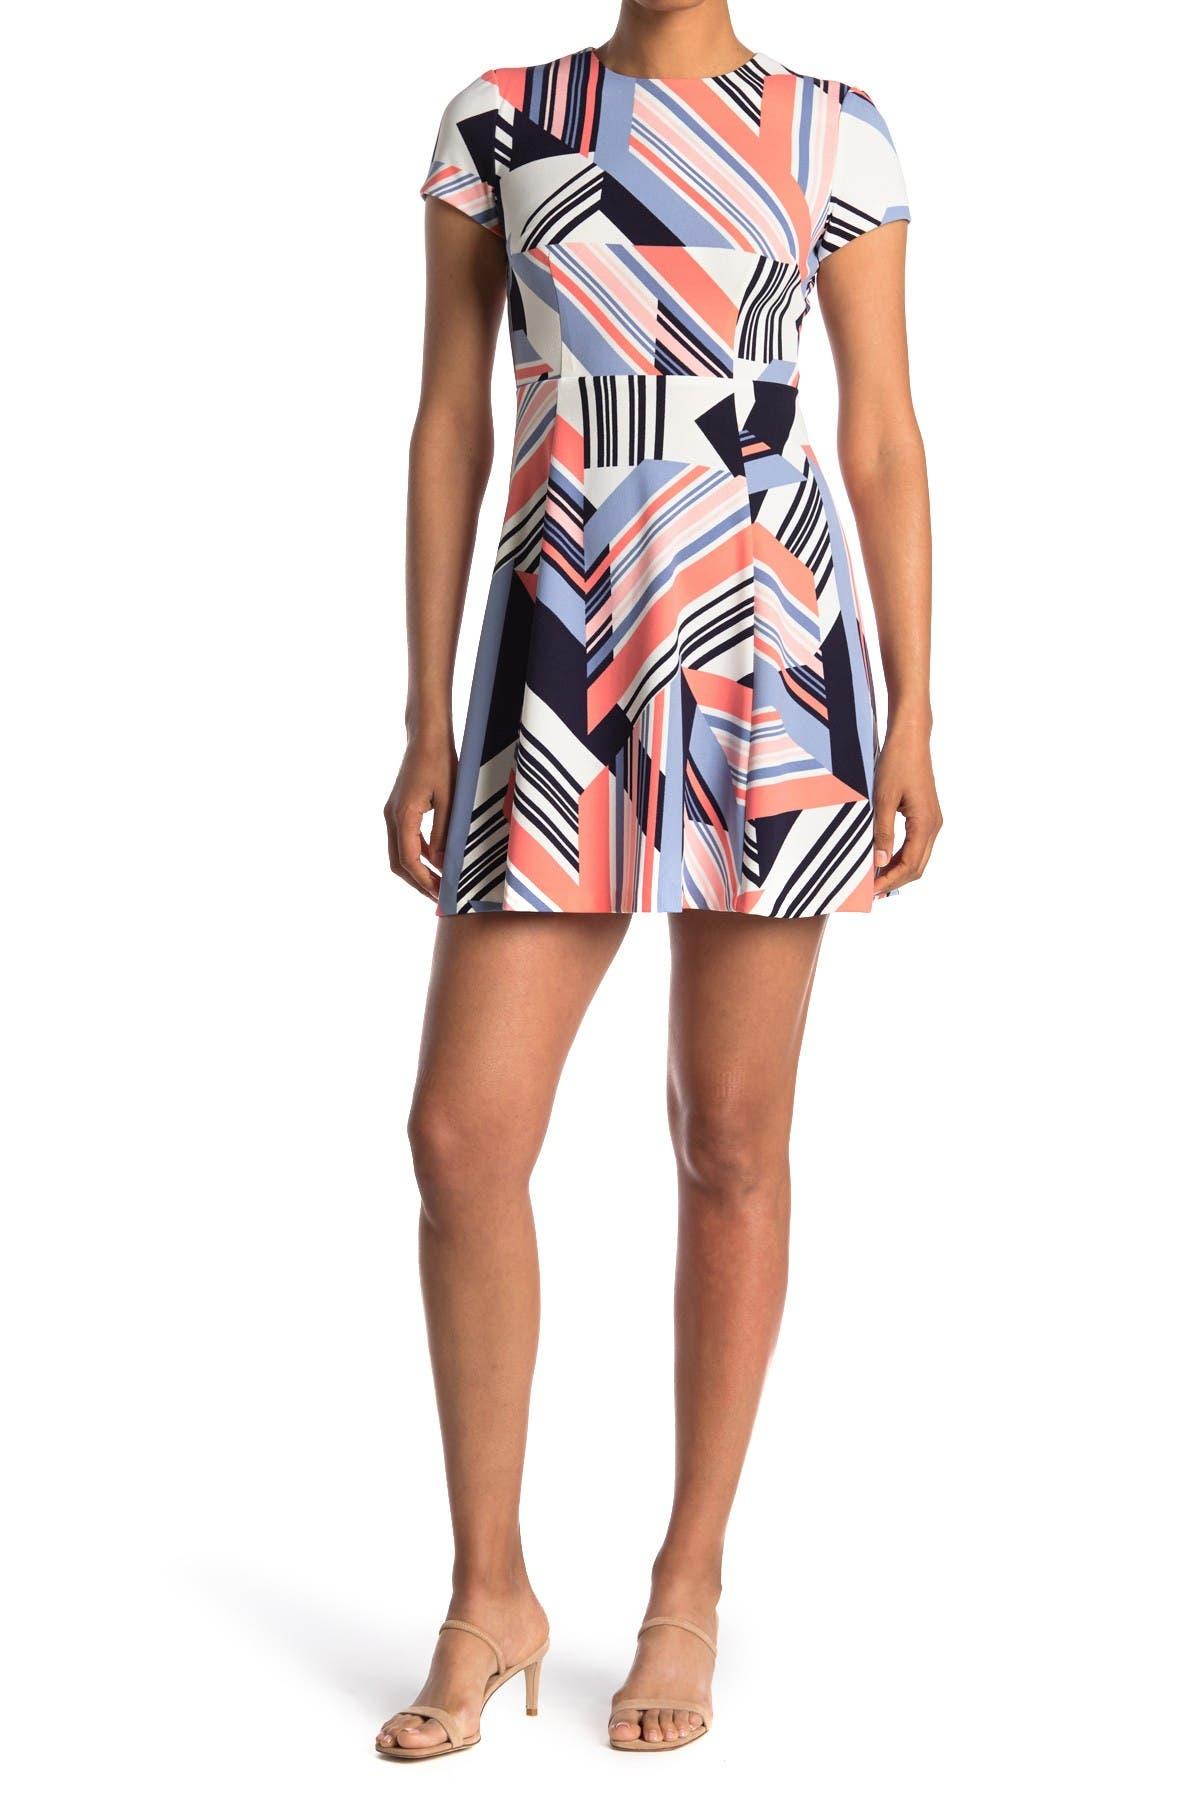 Image of Vince Camuto Geometric Print Short Sleeve Scuba Dress